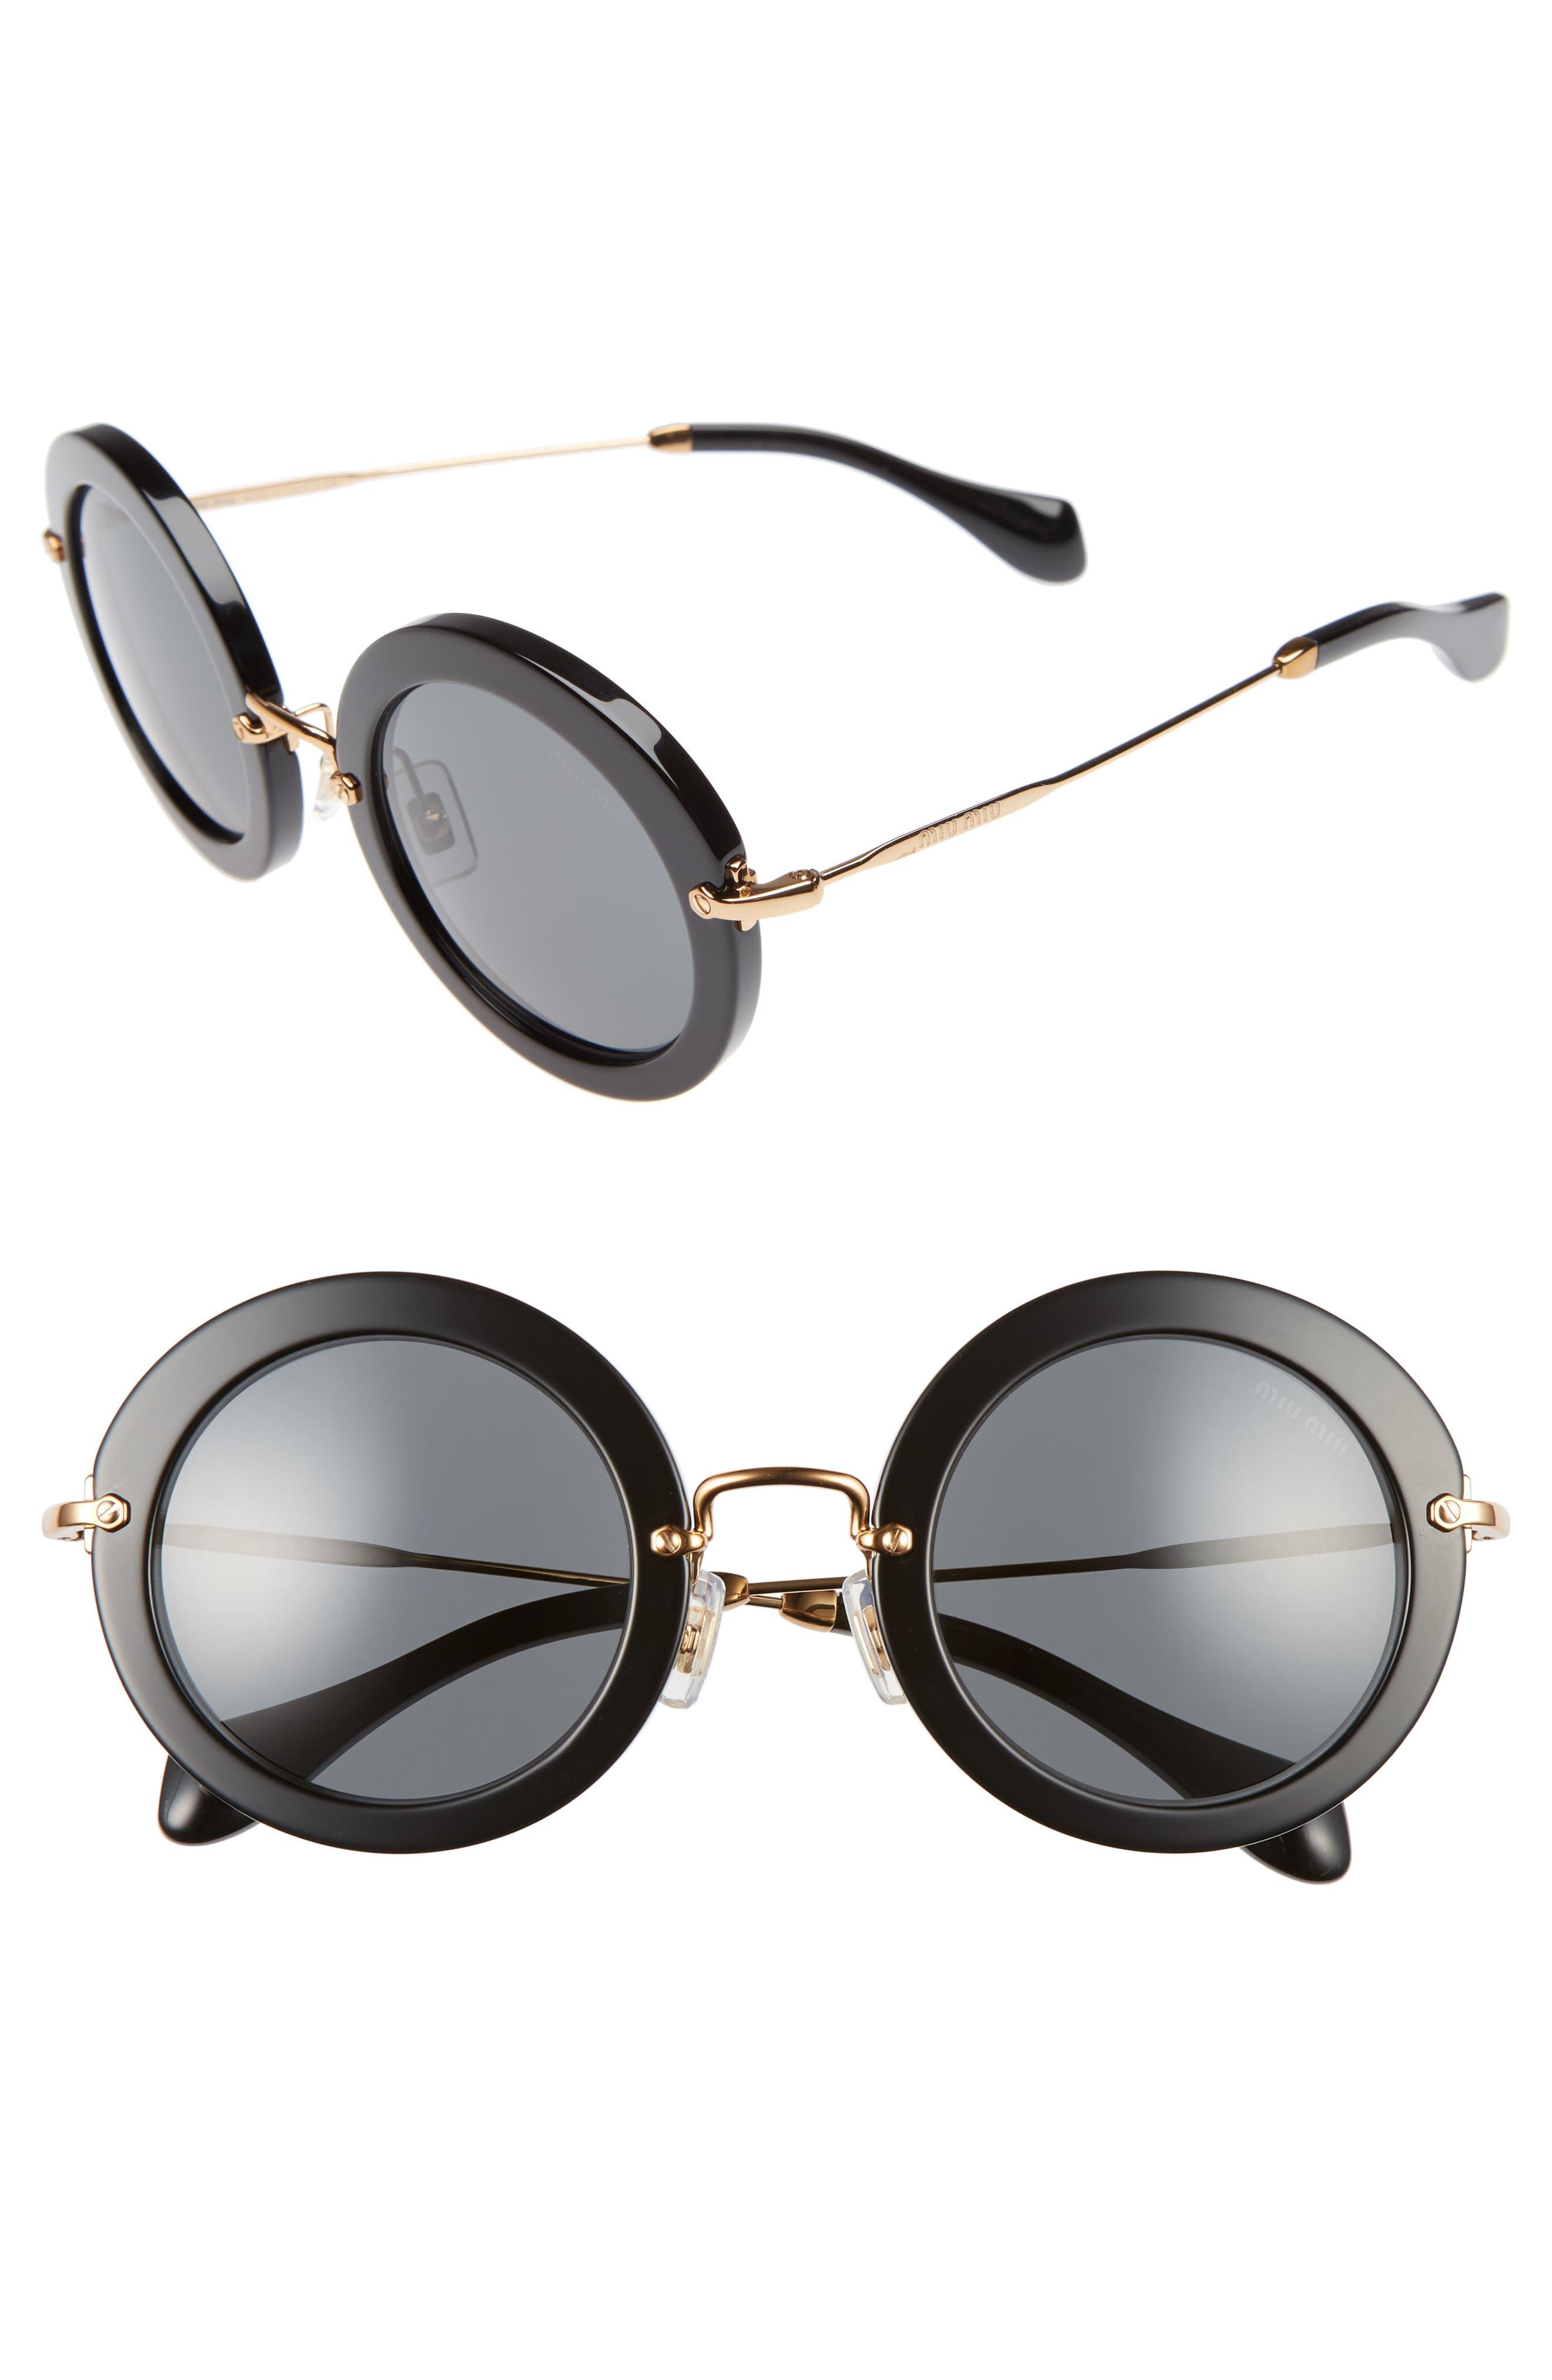 49mm Round Retro Sunglasses,                             Alternate thumbnail 2, color,                             001